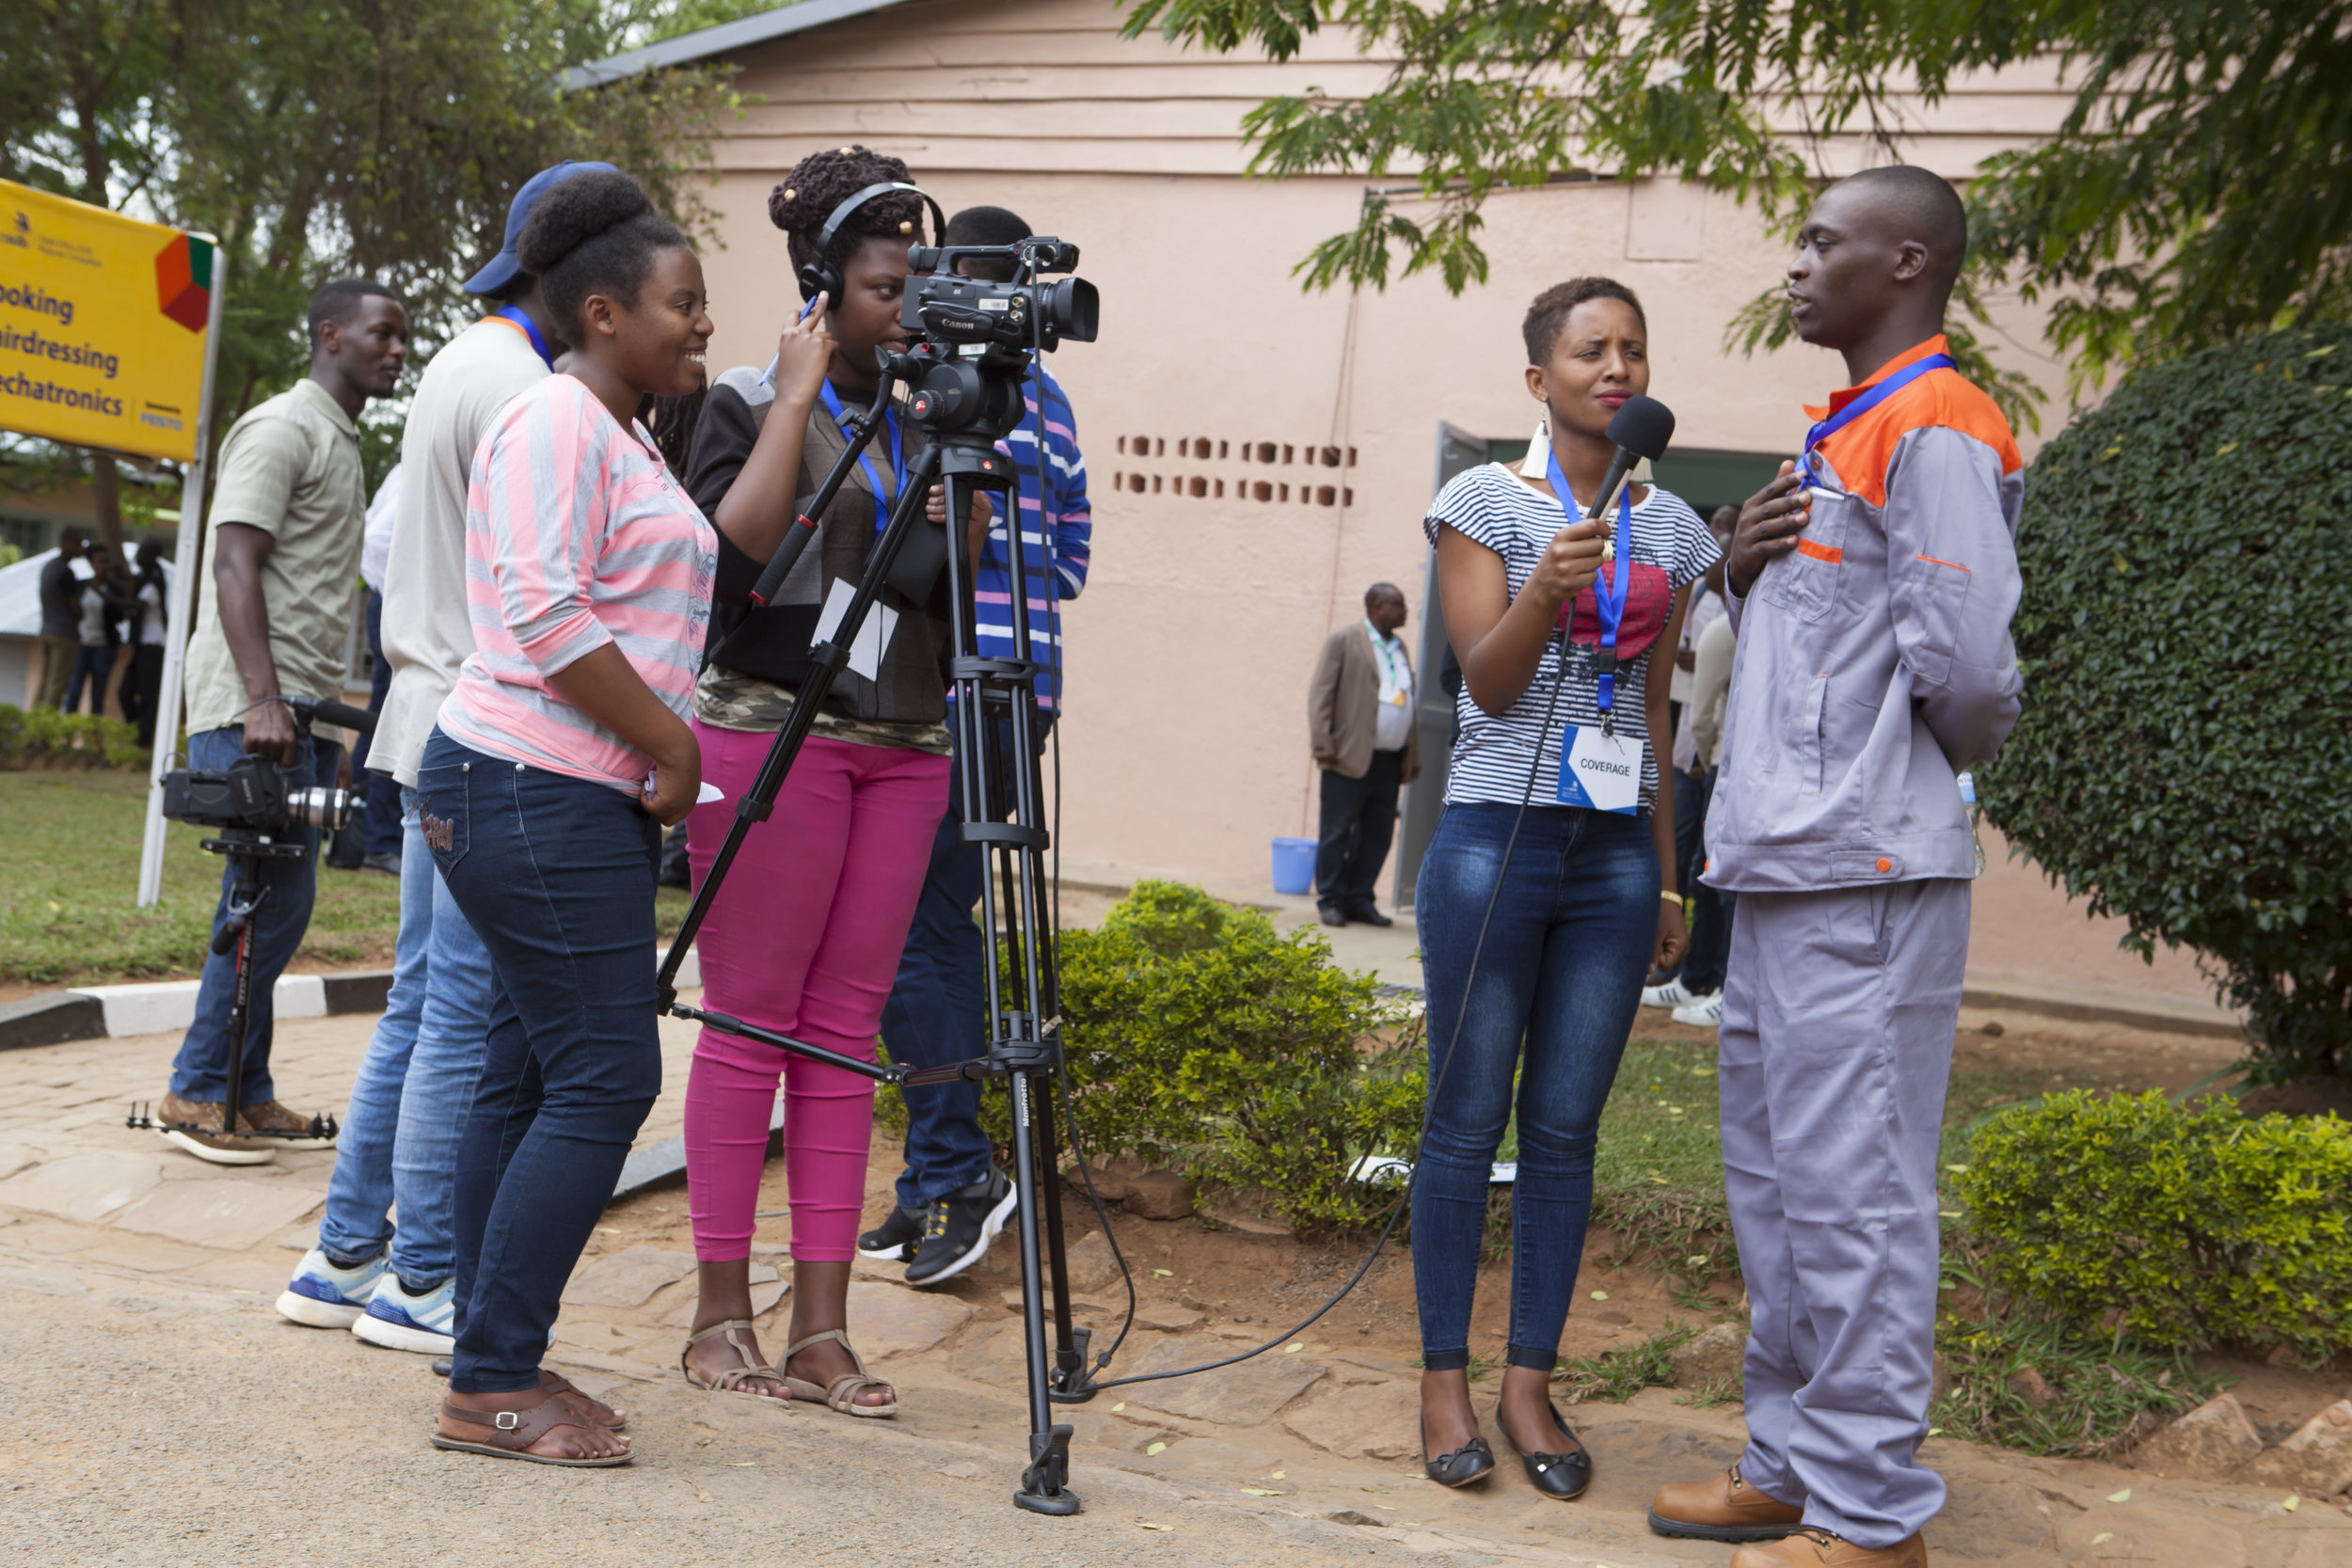 ADMA students Therese Mukundente, Sandrine Iragena, and Liliane Ikuze Filming at WorldSkills Competition at IPRC Kigali